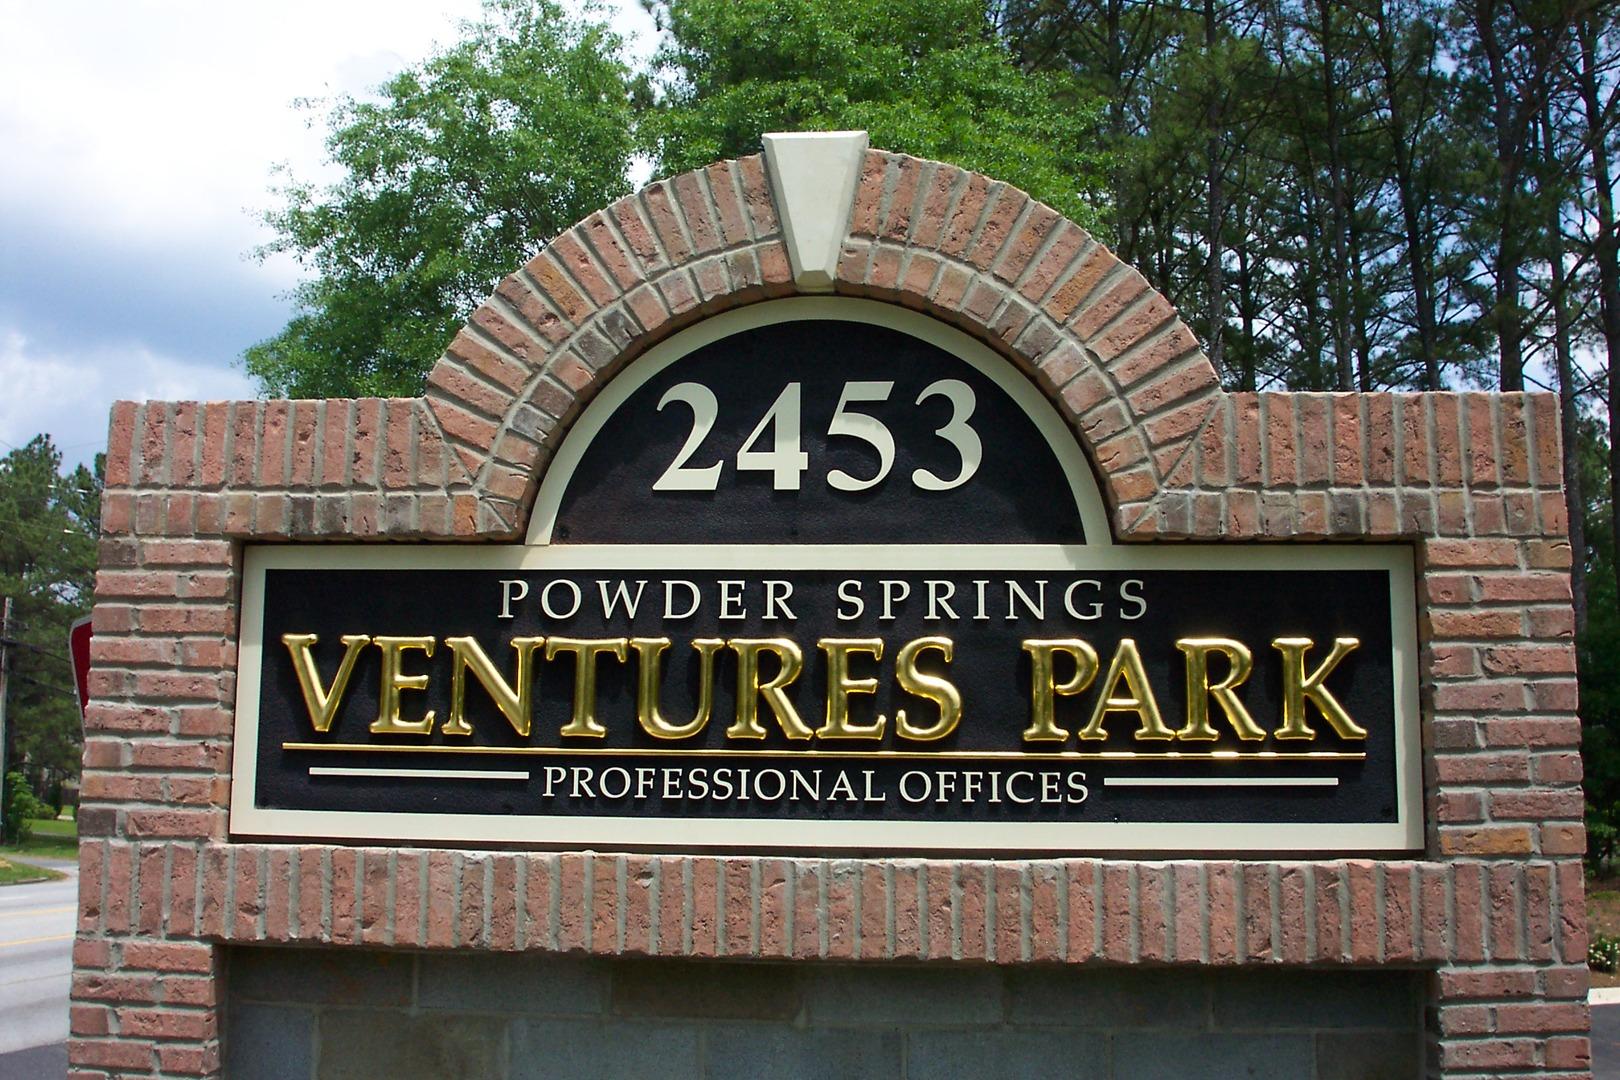 ventures park.jpg